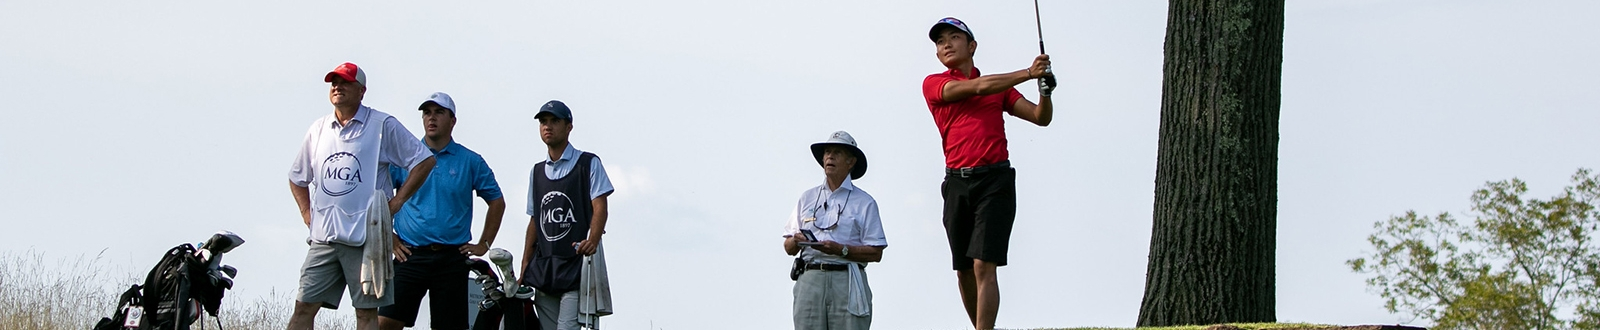 Golfers on a tee box